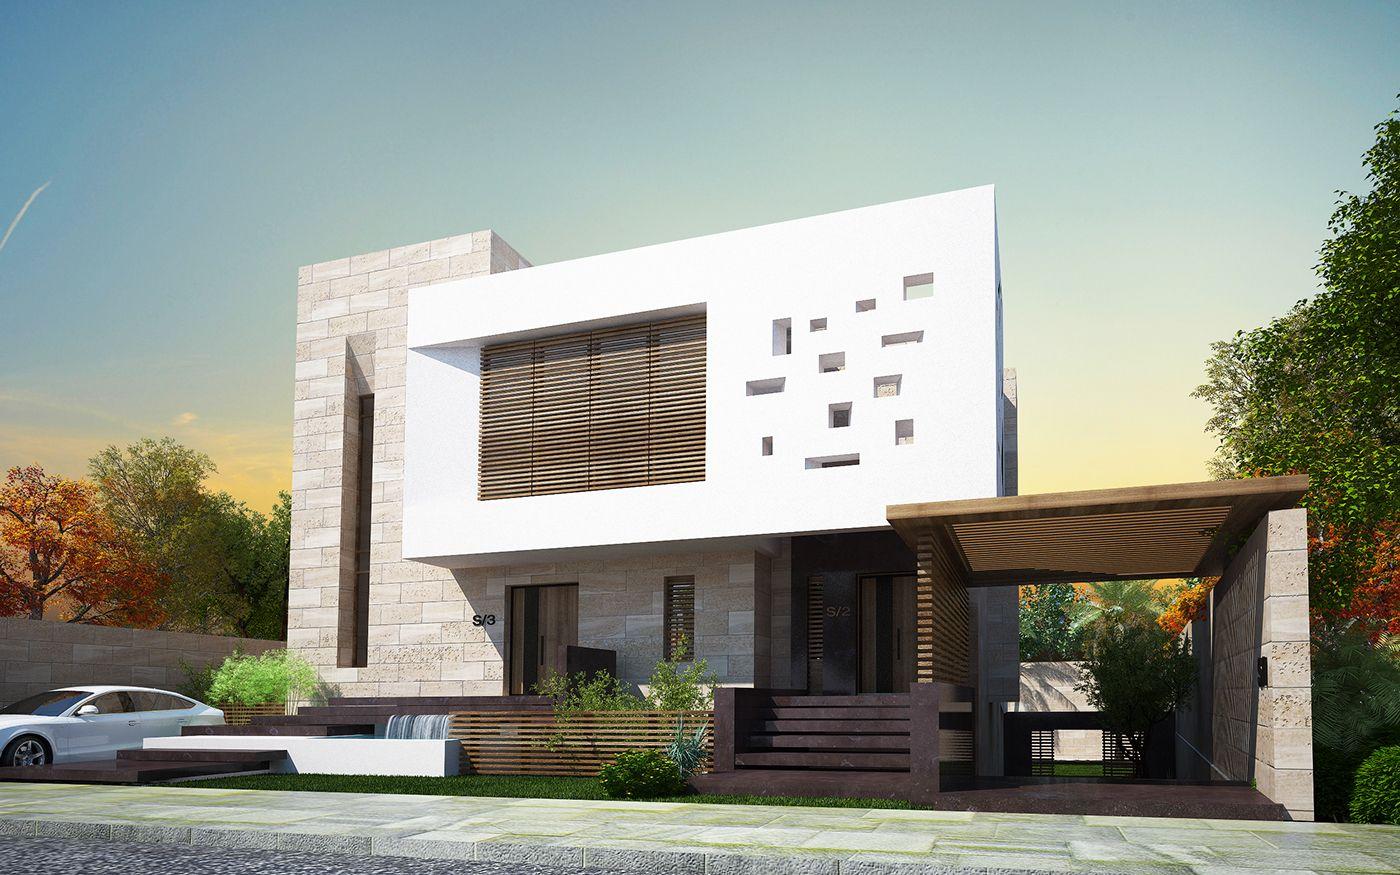 a6fb22fc8d823d830d43c5ba983588da.jpg (1400×875) | Architecture ...